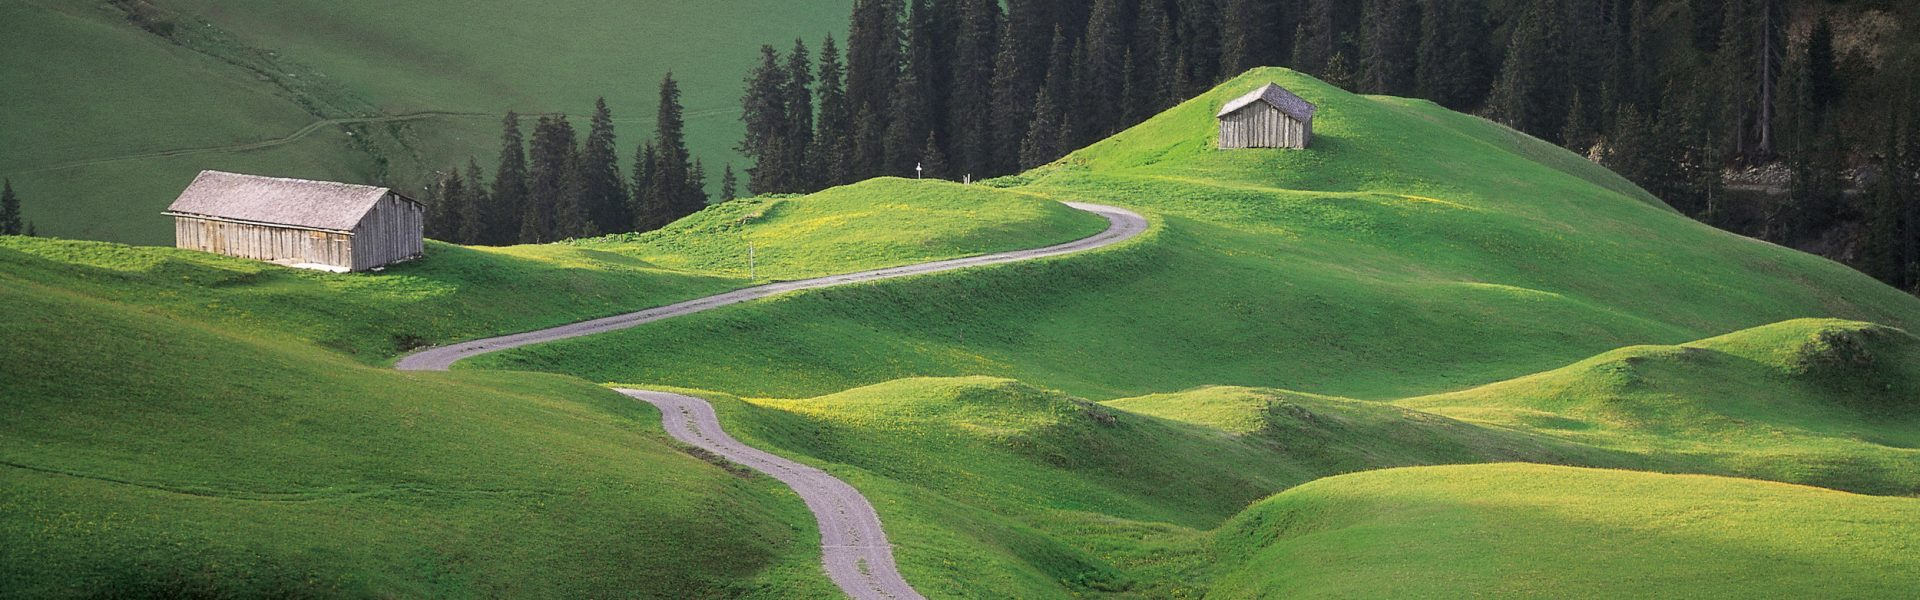 Alpweg Arlberg © Peter Mathis / Vorarlberg Tourismus